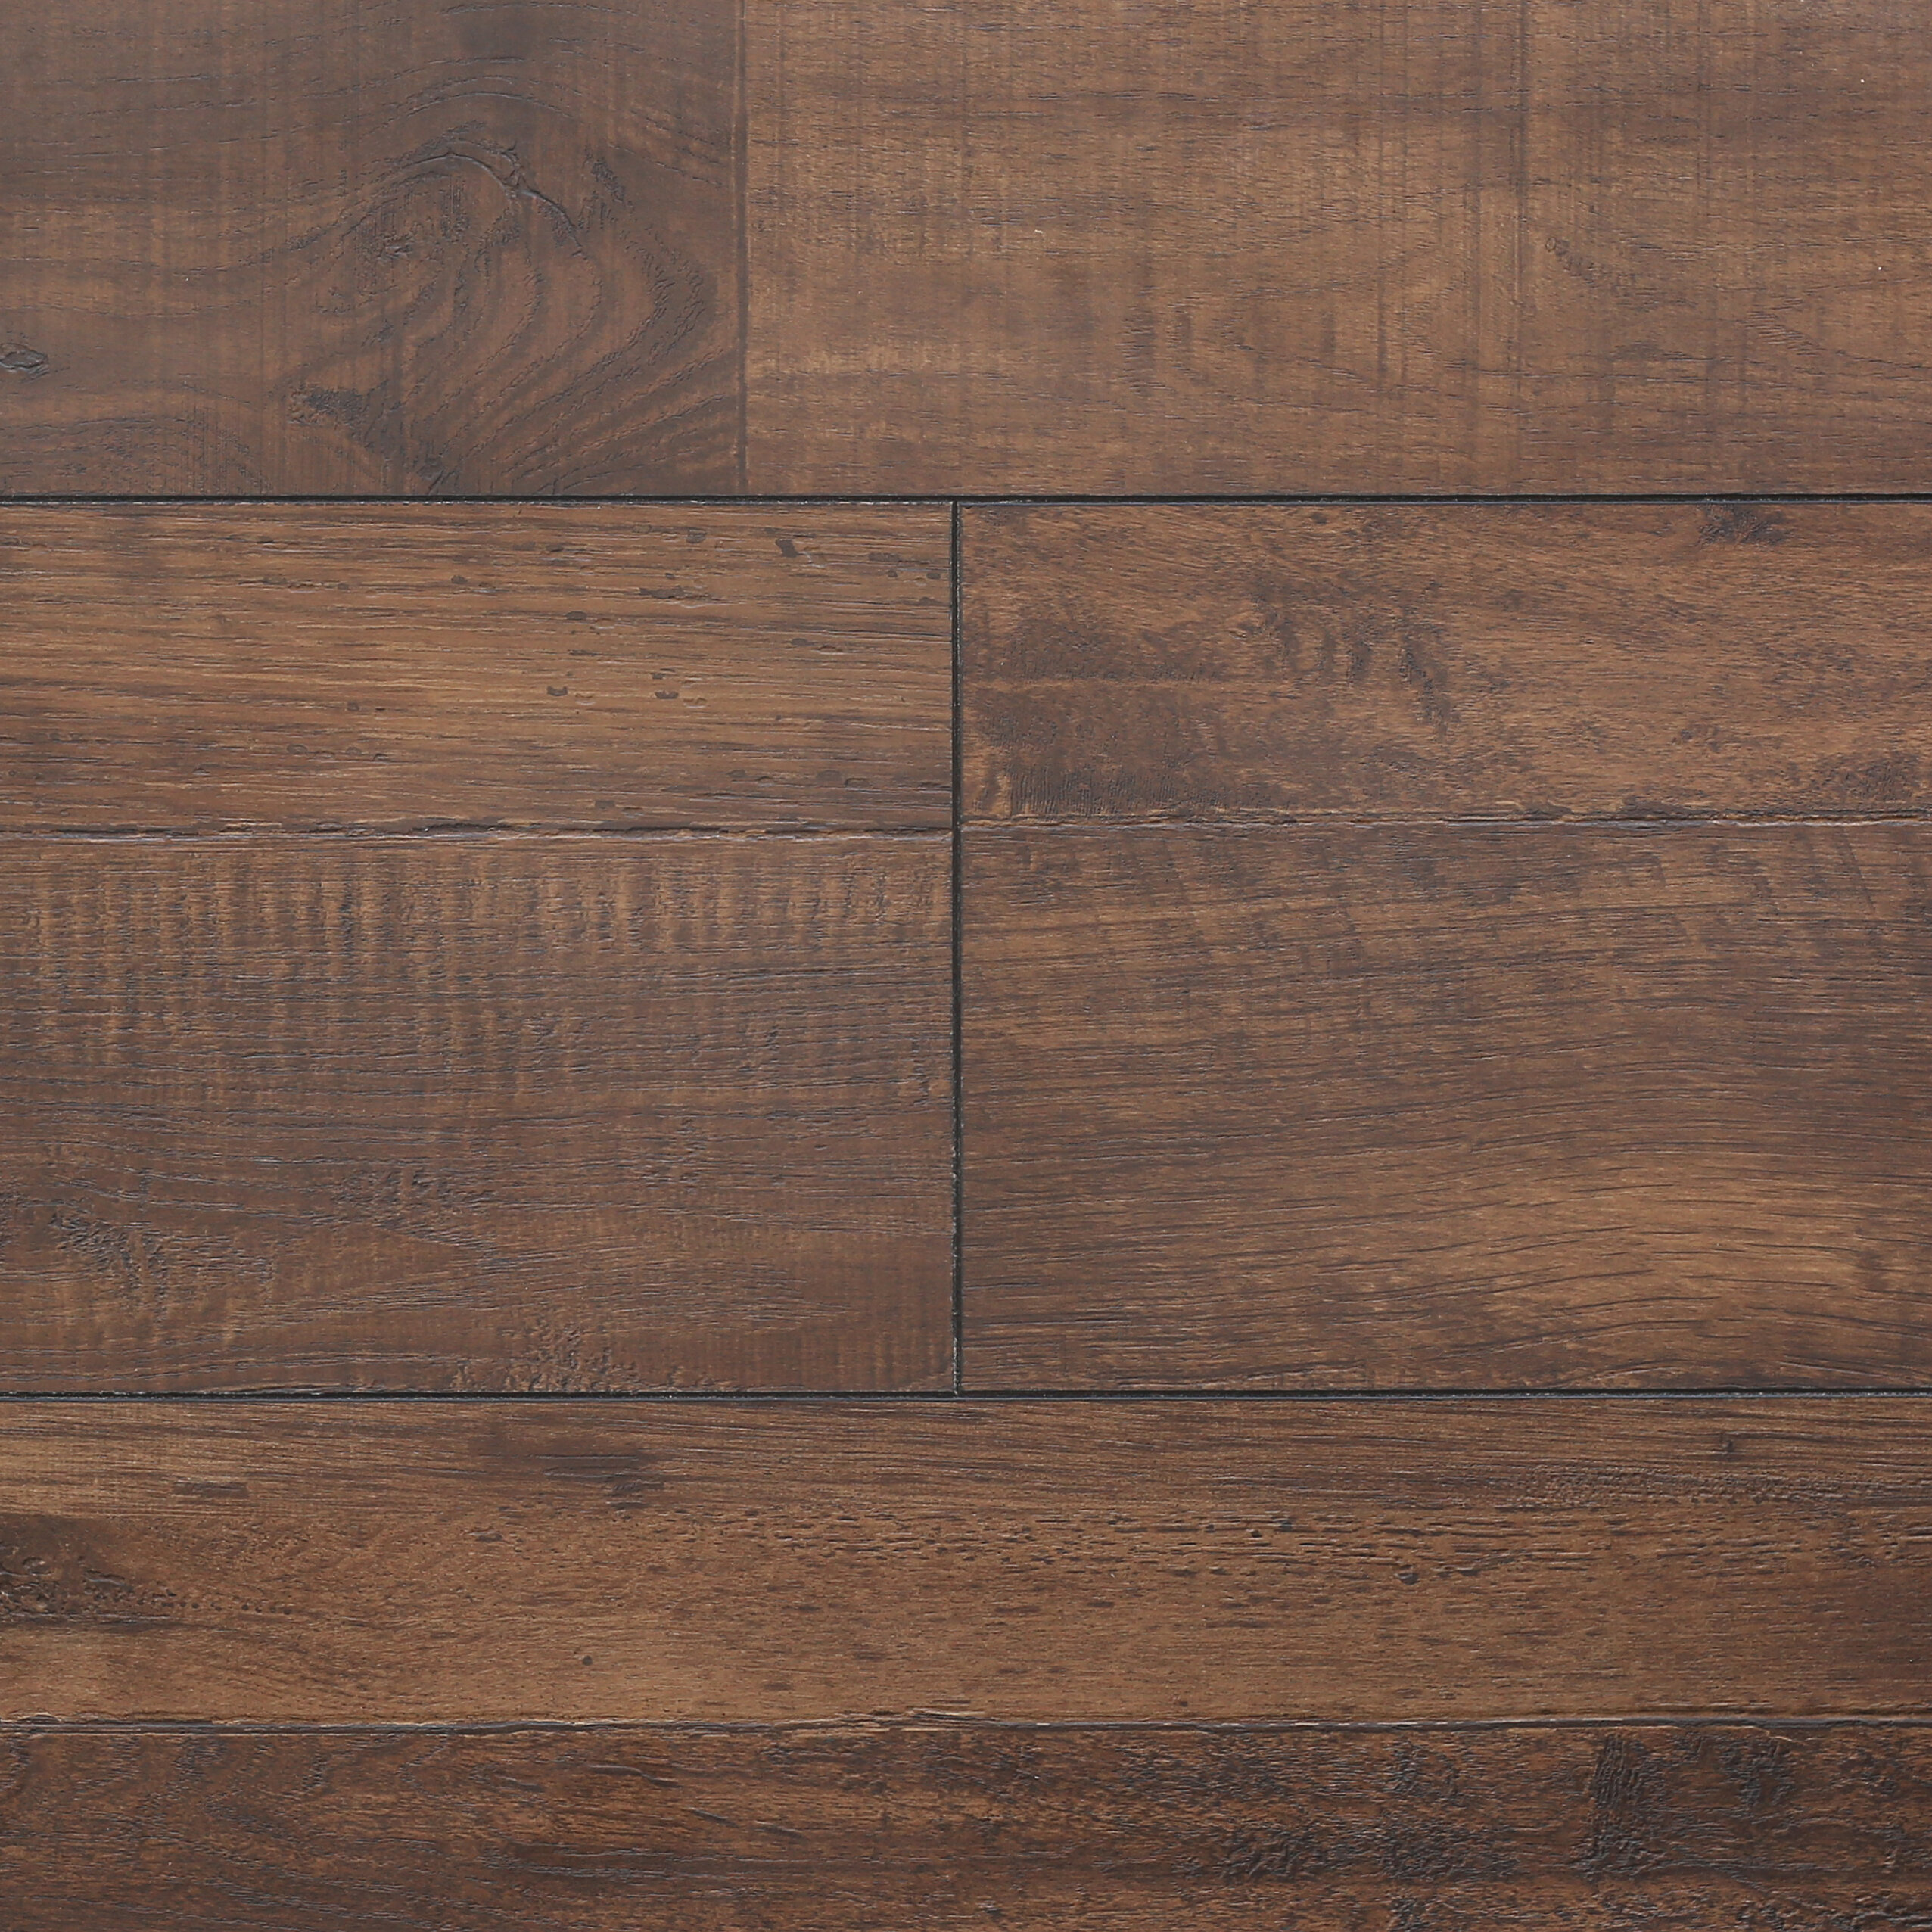 "Serradon 8"" x 48"" x 12 3mm Laminate Flooring in Vintage Timber"